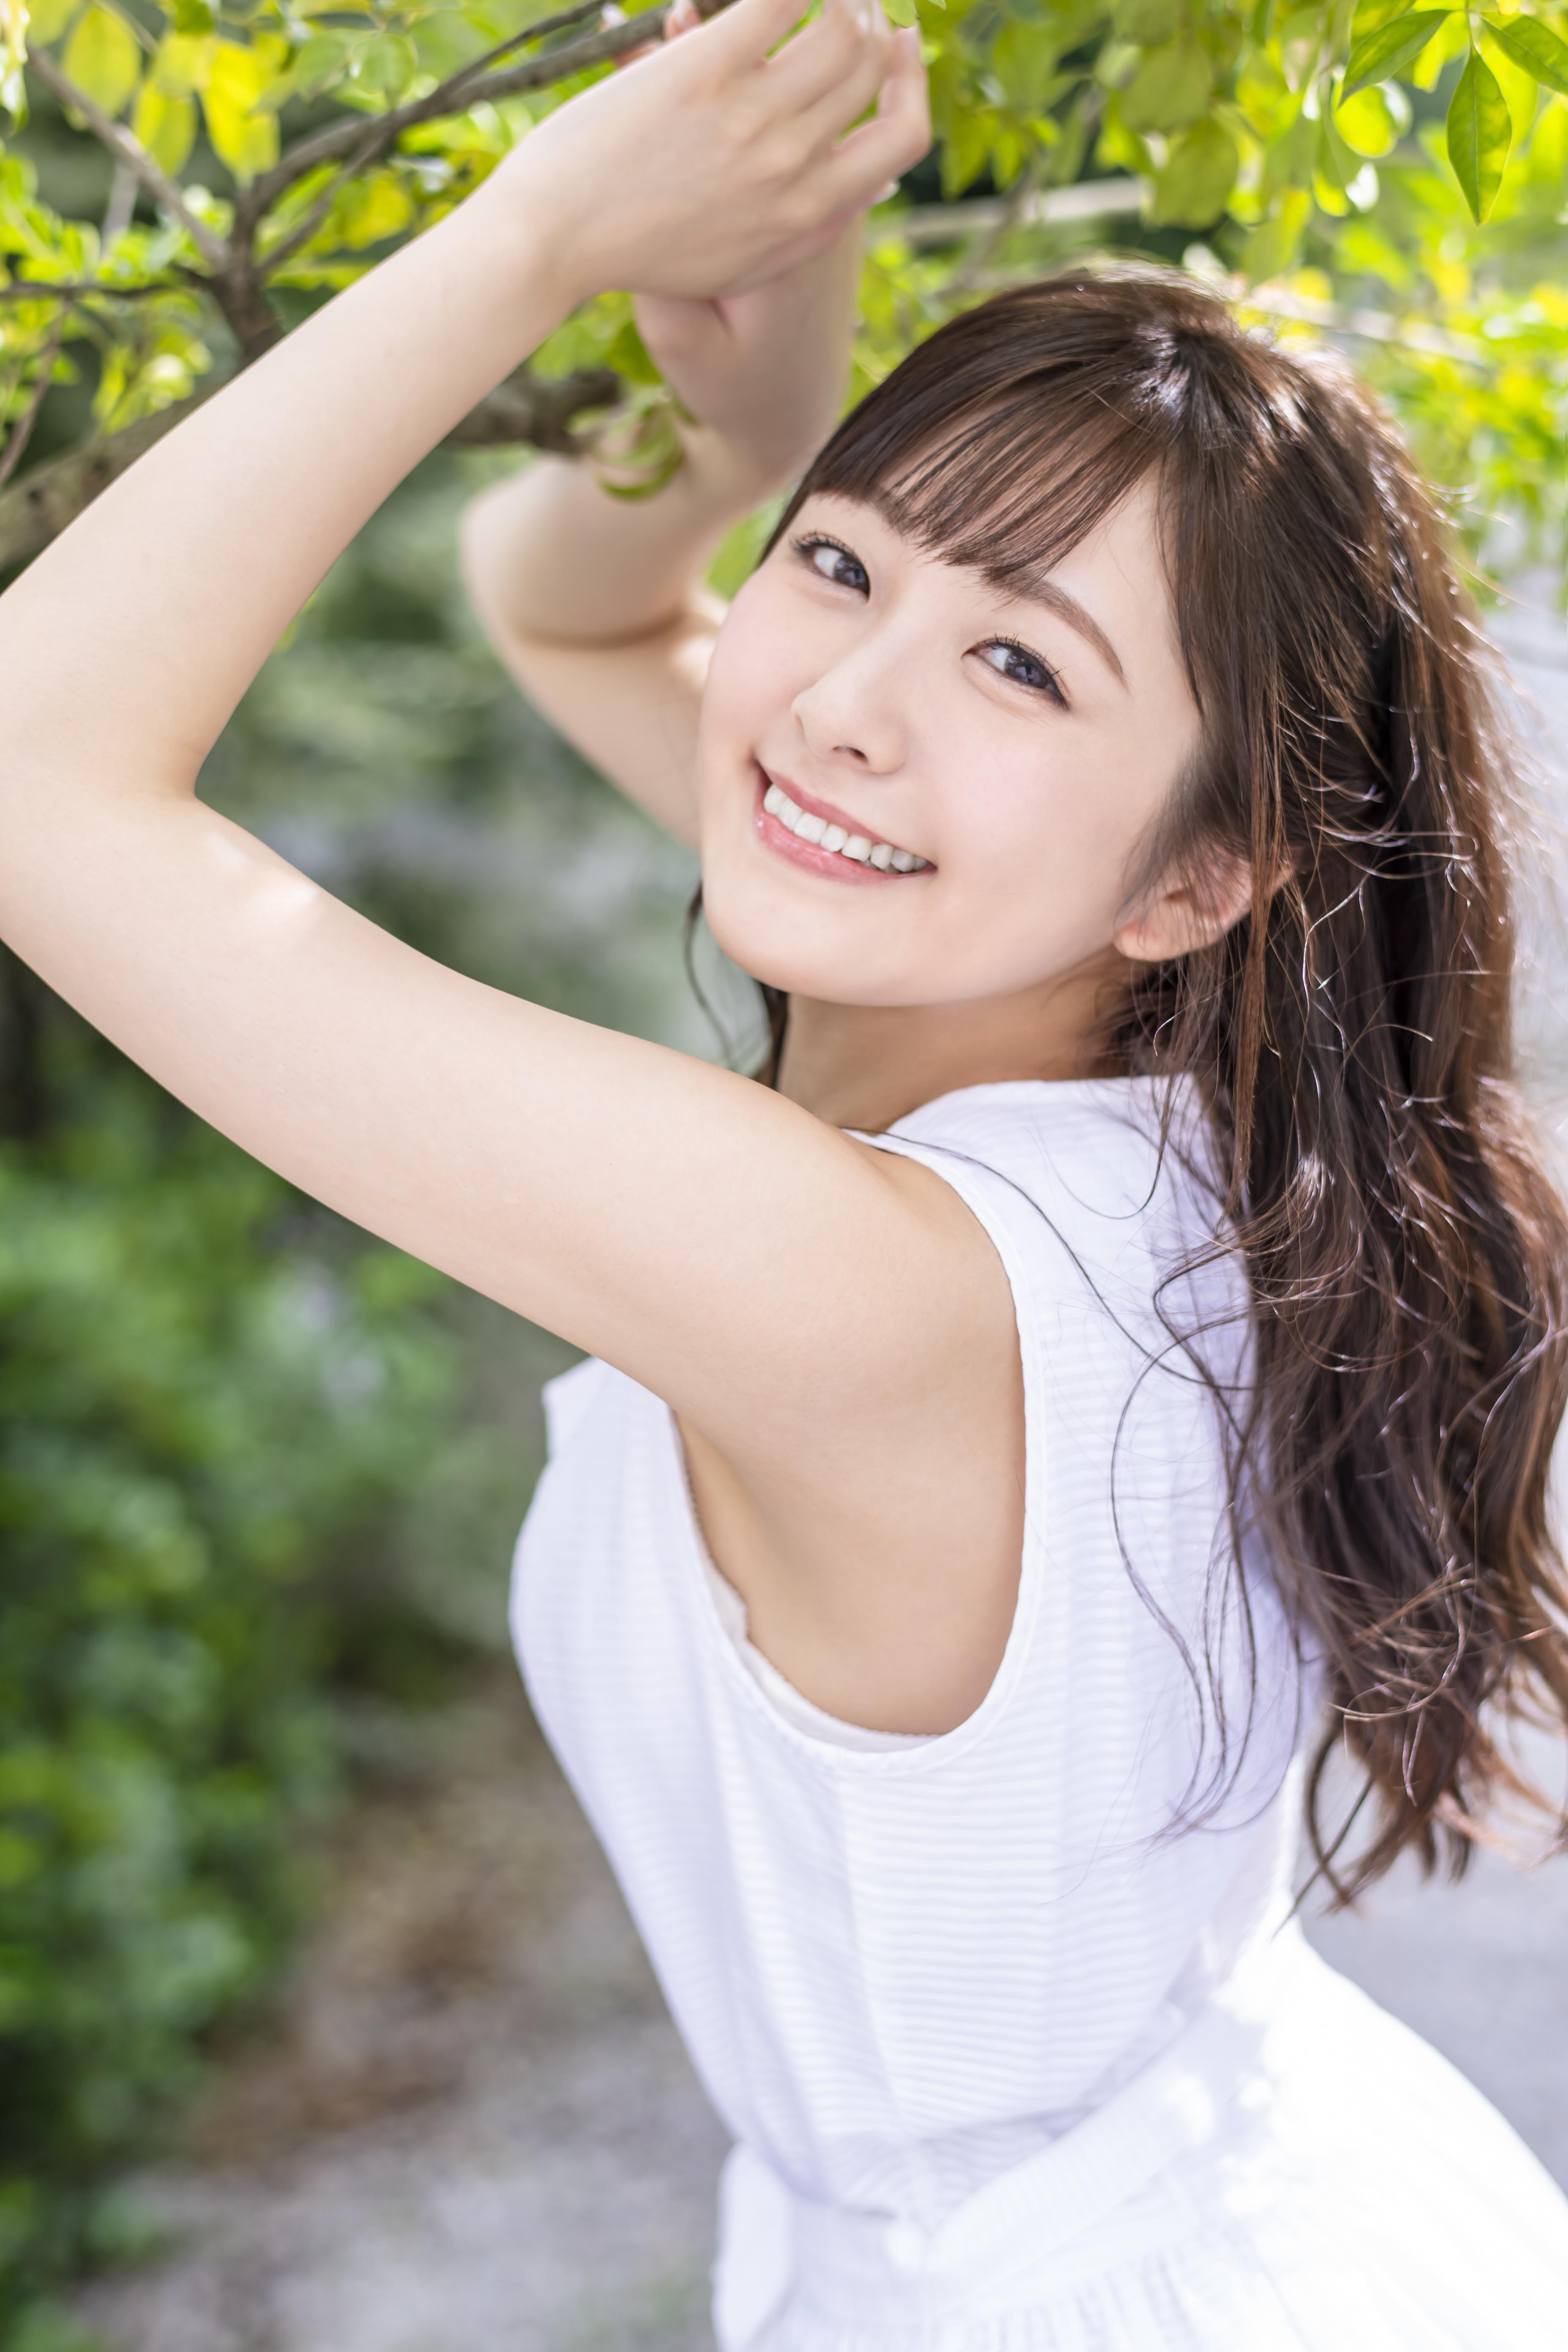 【SODstar】青空ひかりイベント!@秋葉原画像